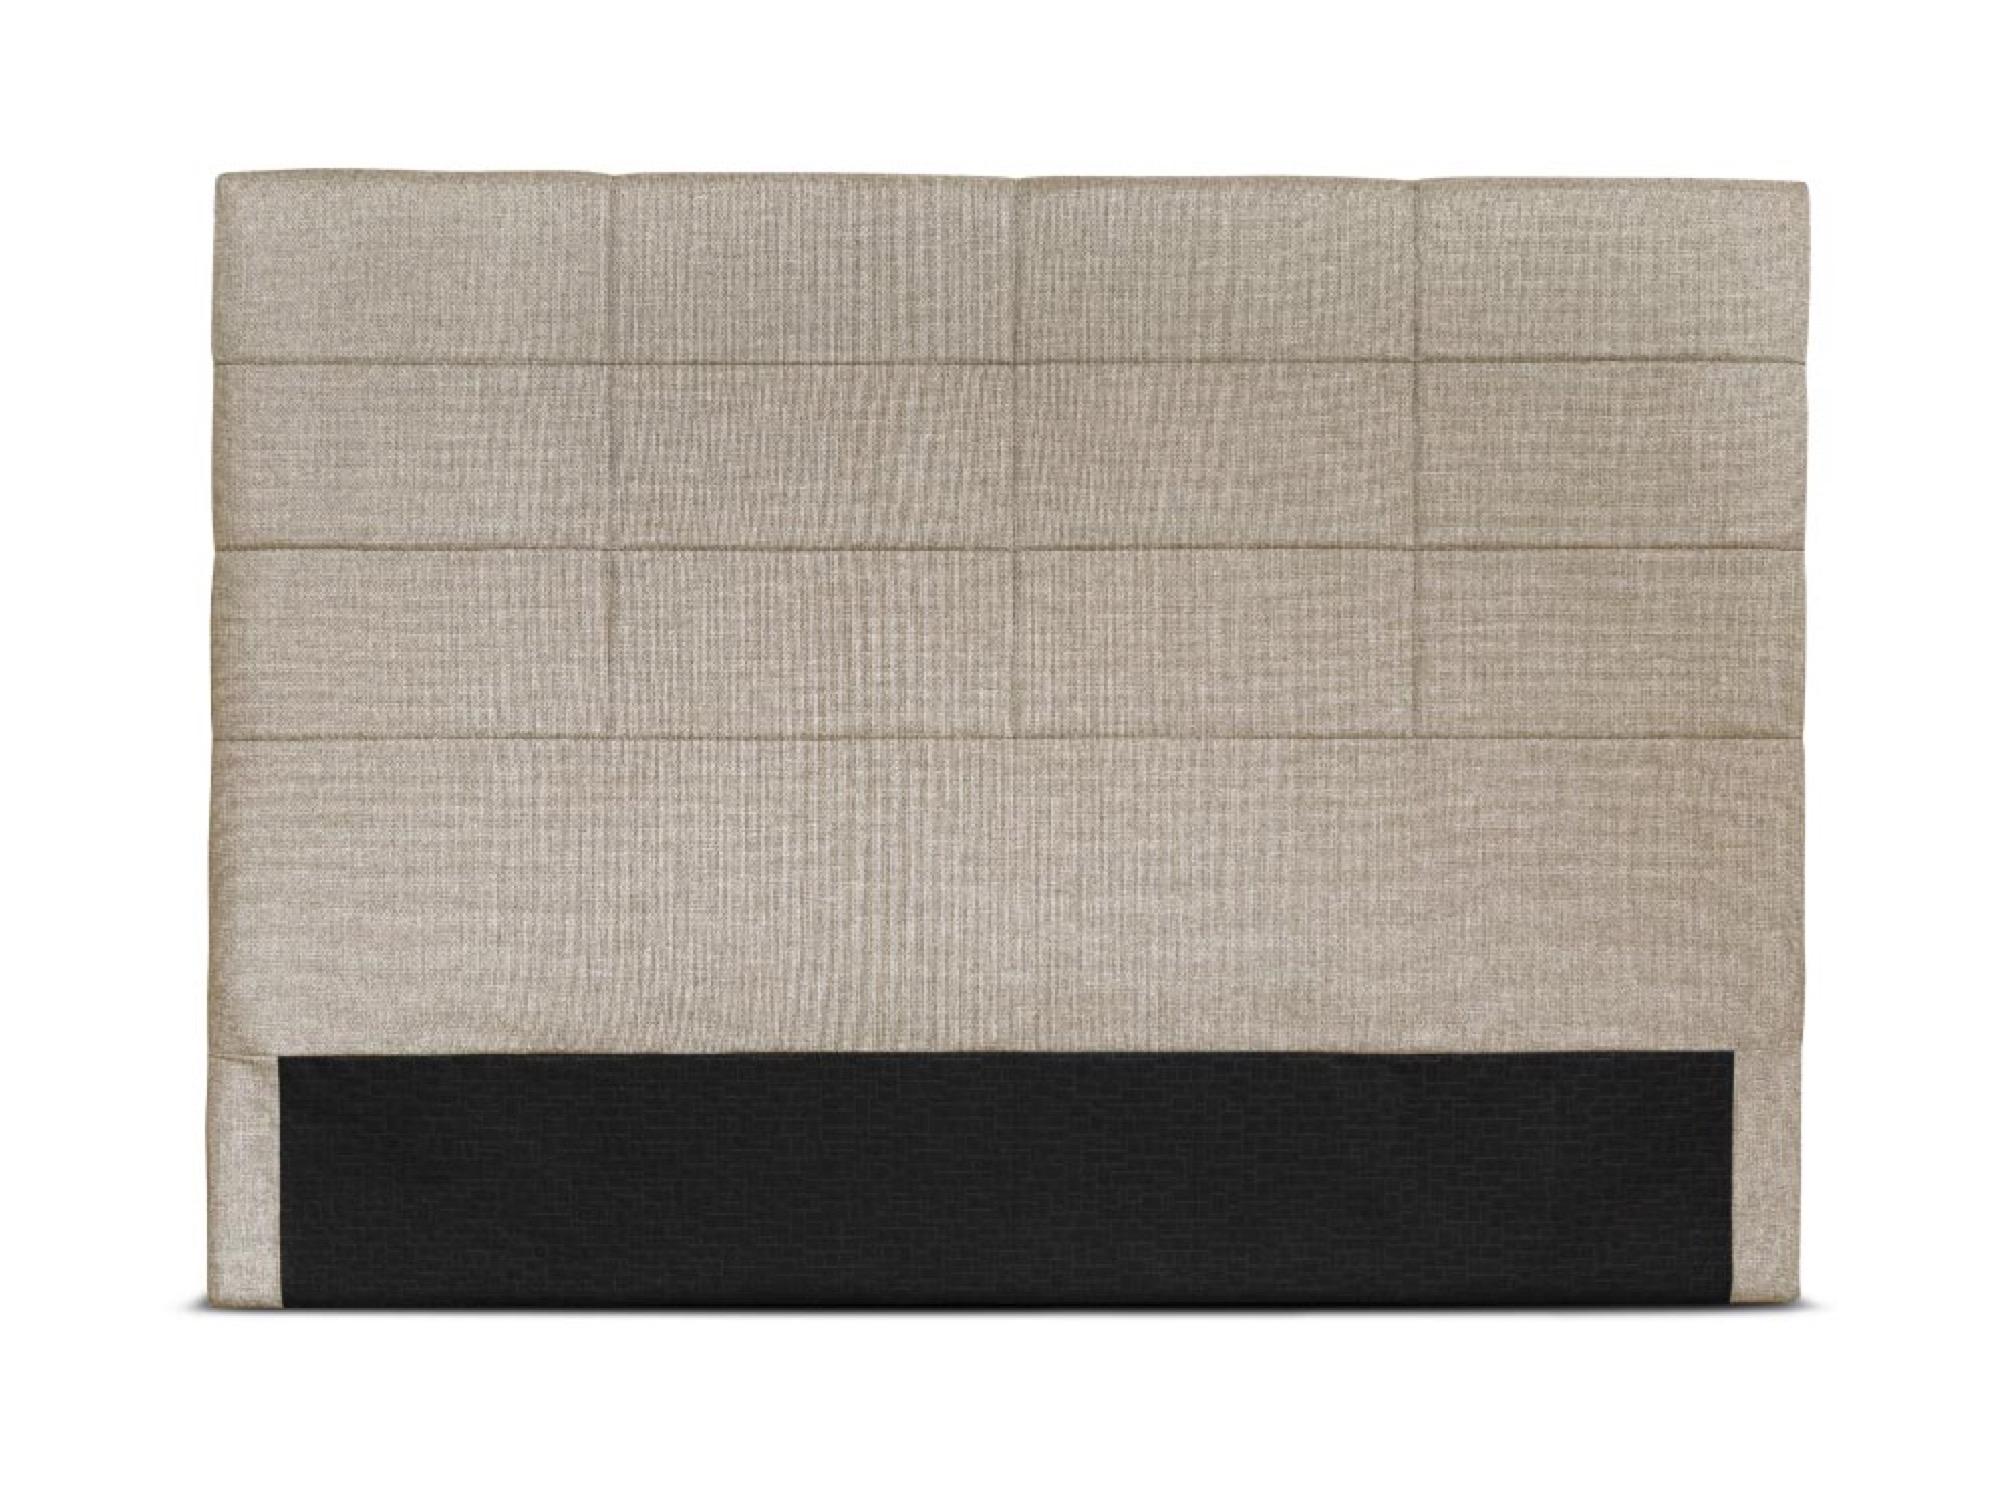 Tête de lit en tissu beige - 140cm